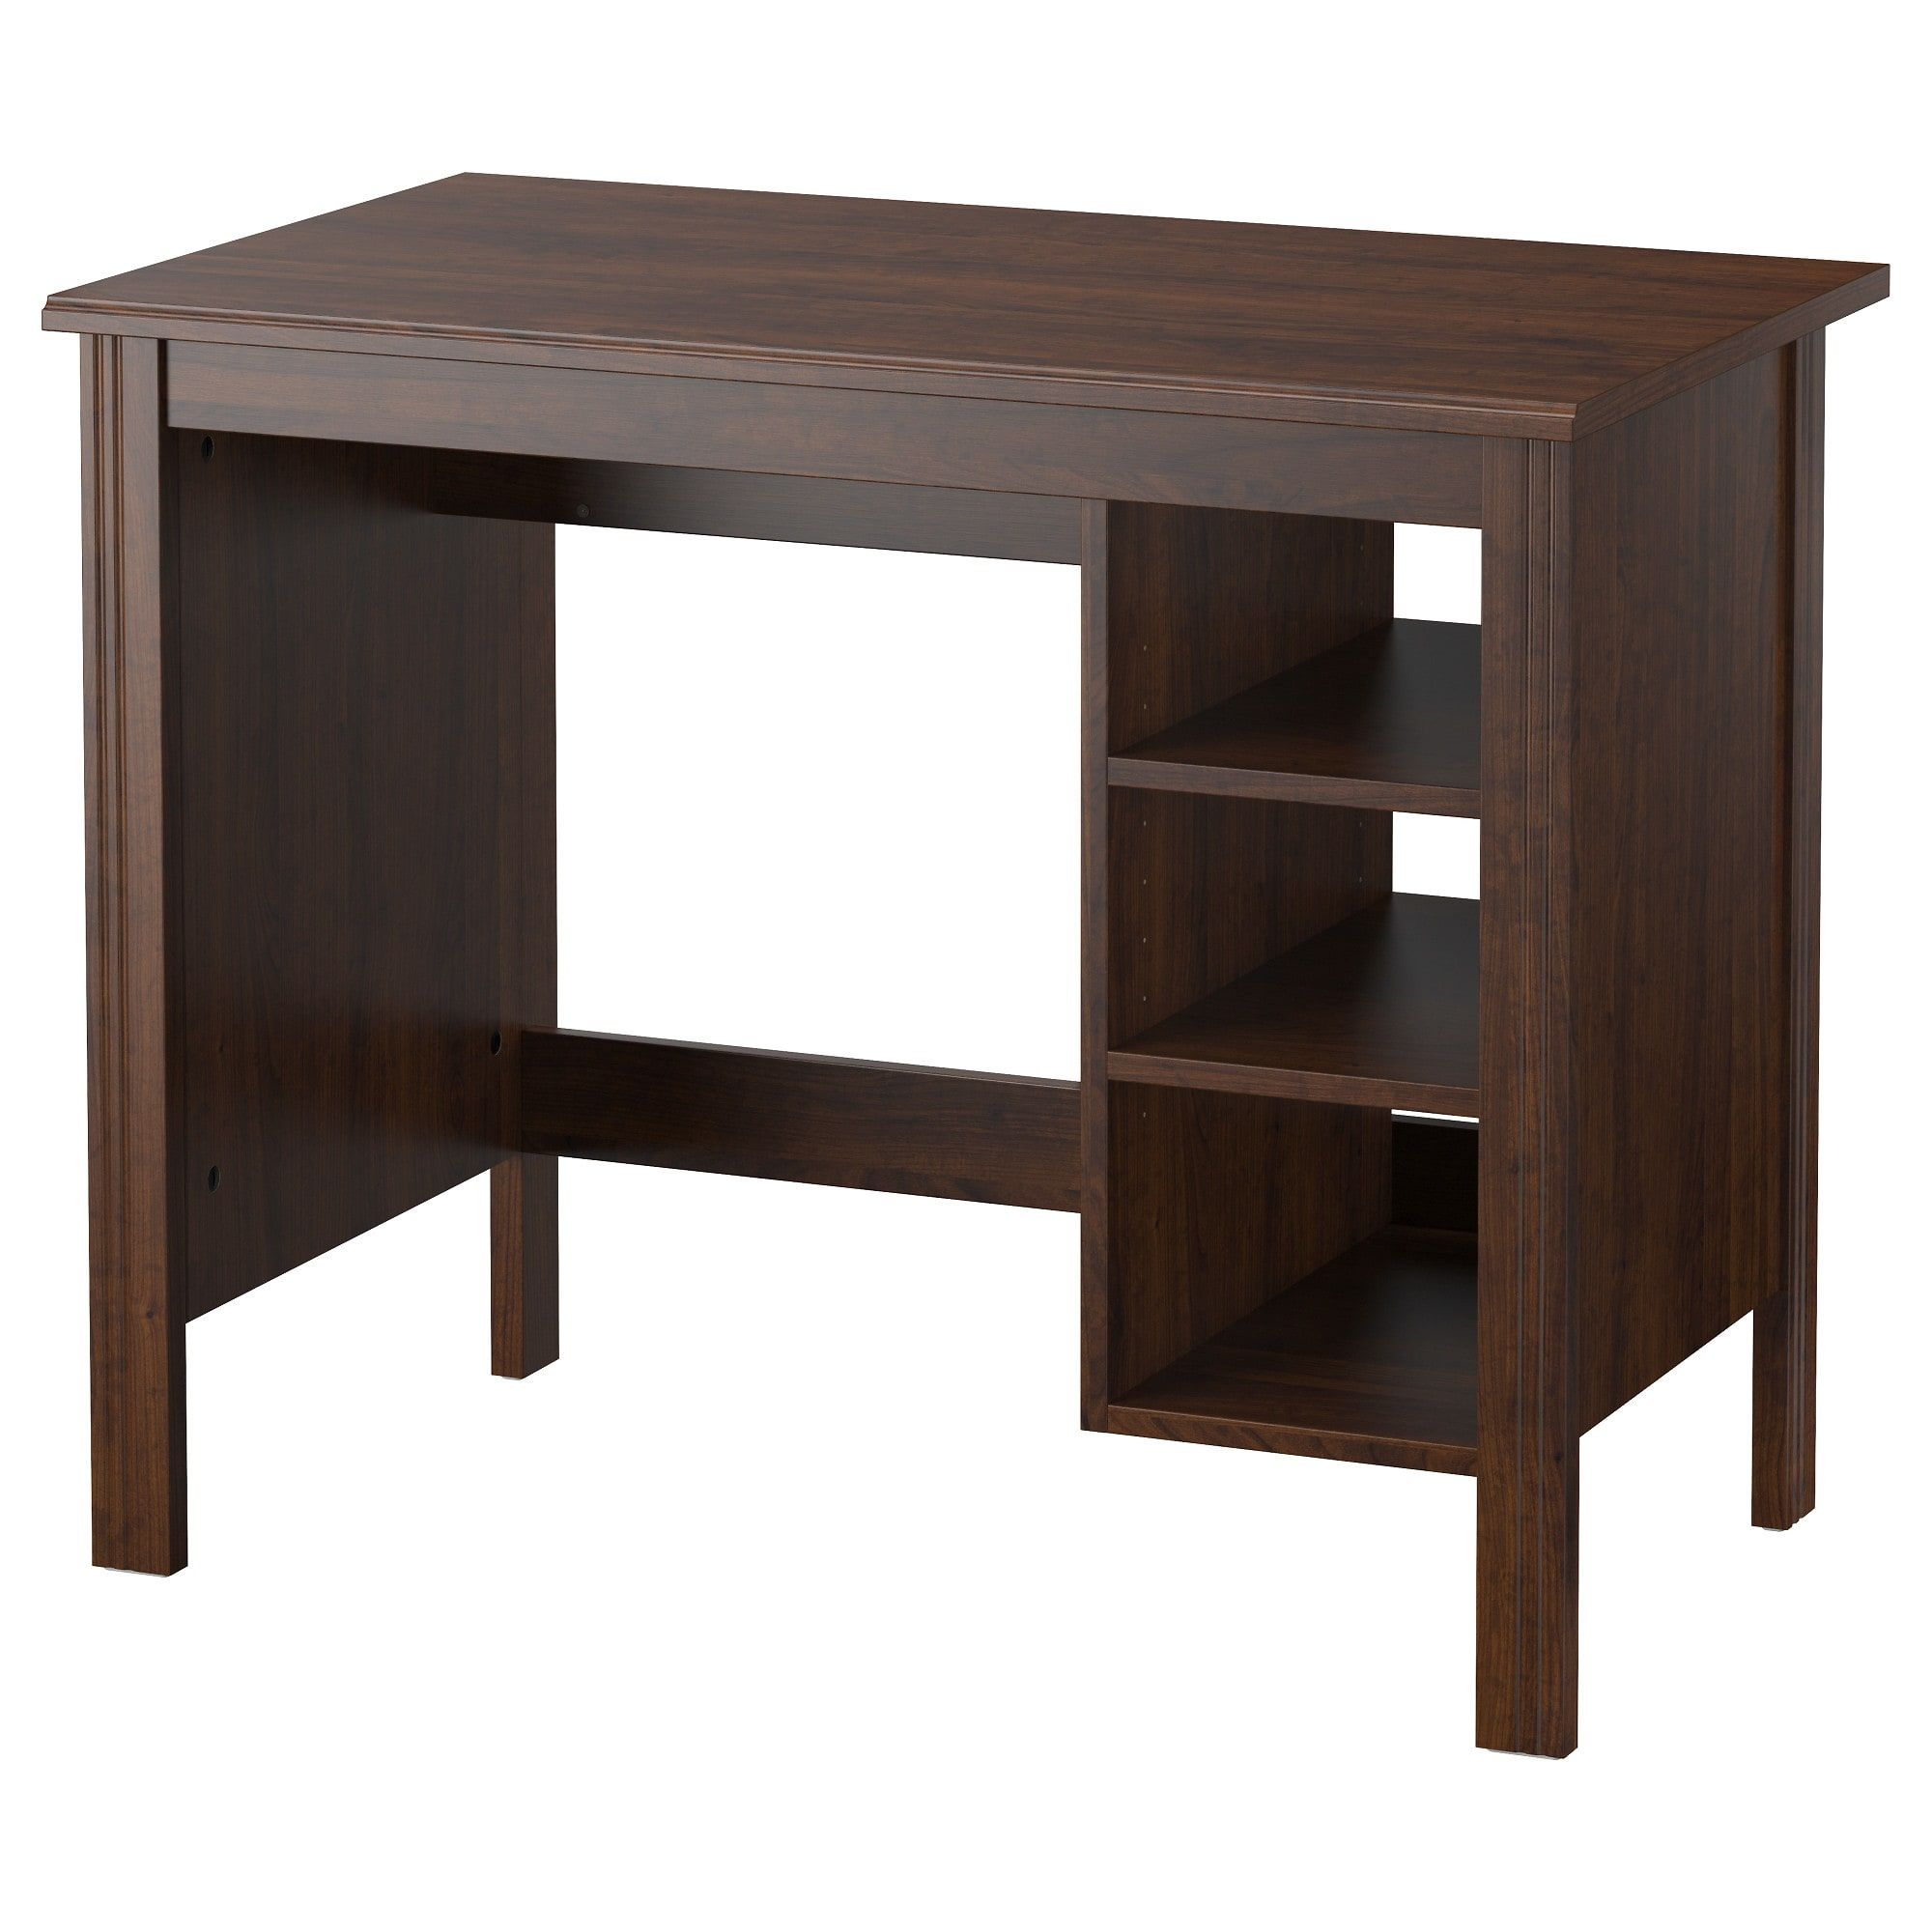 Brusali Desk Brown Ikea Ikea Brusali Ikea Desk Brusali